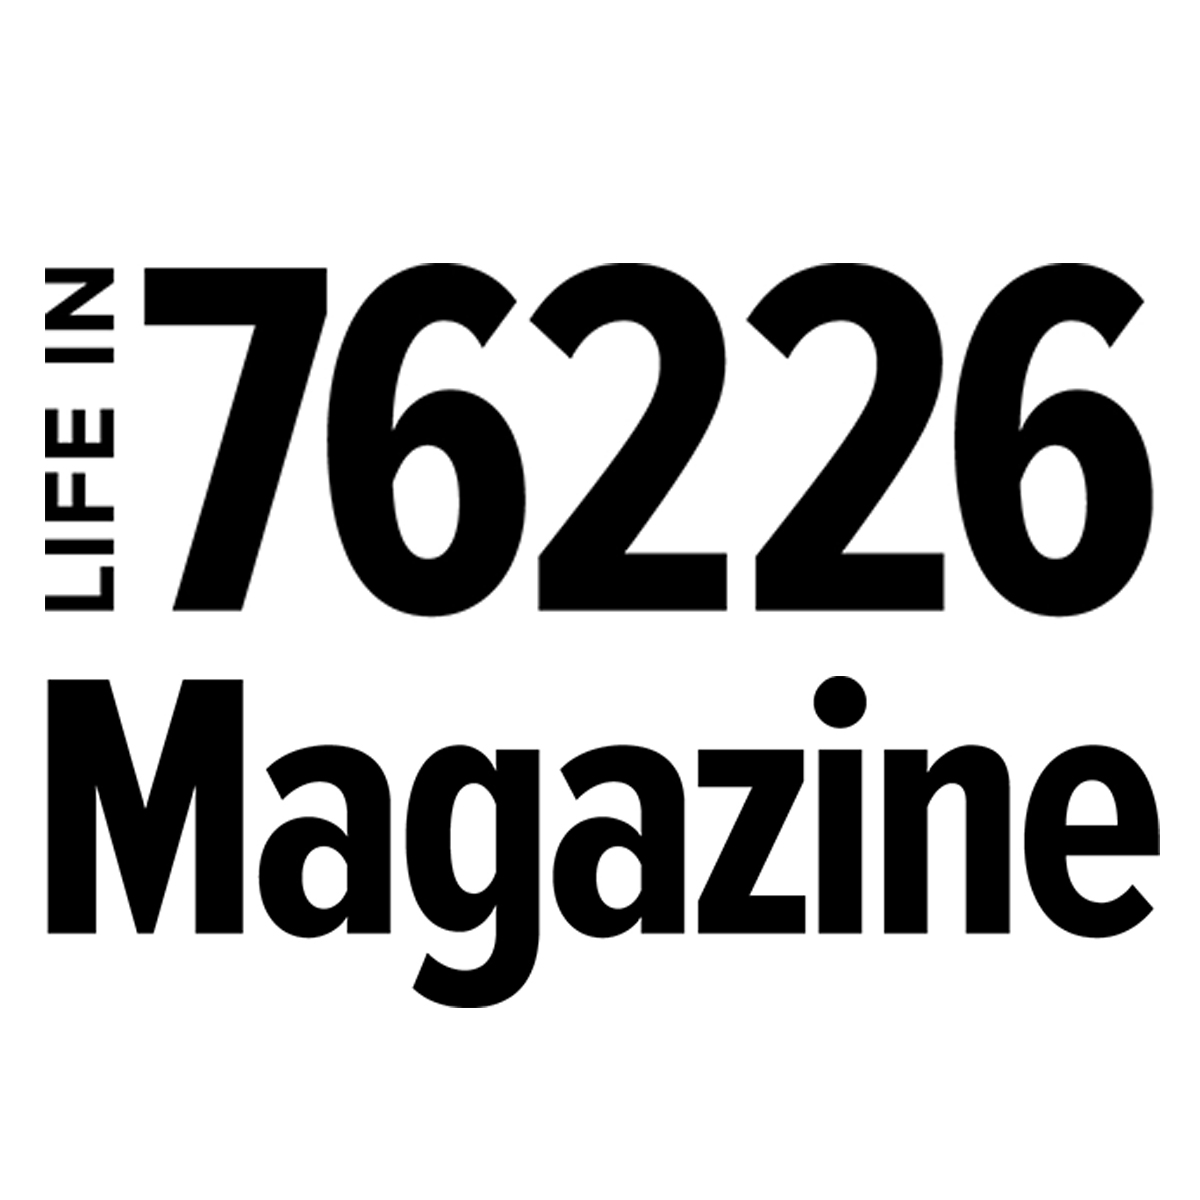 76226 Magazine